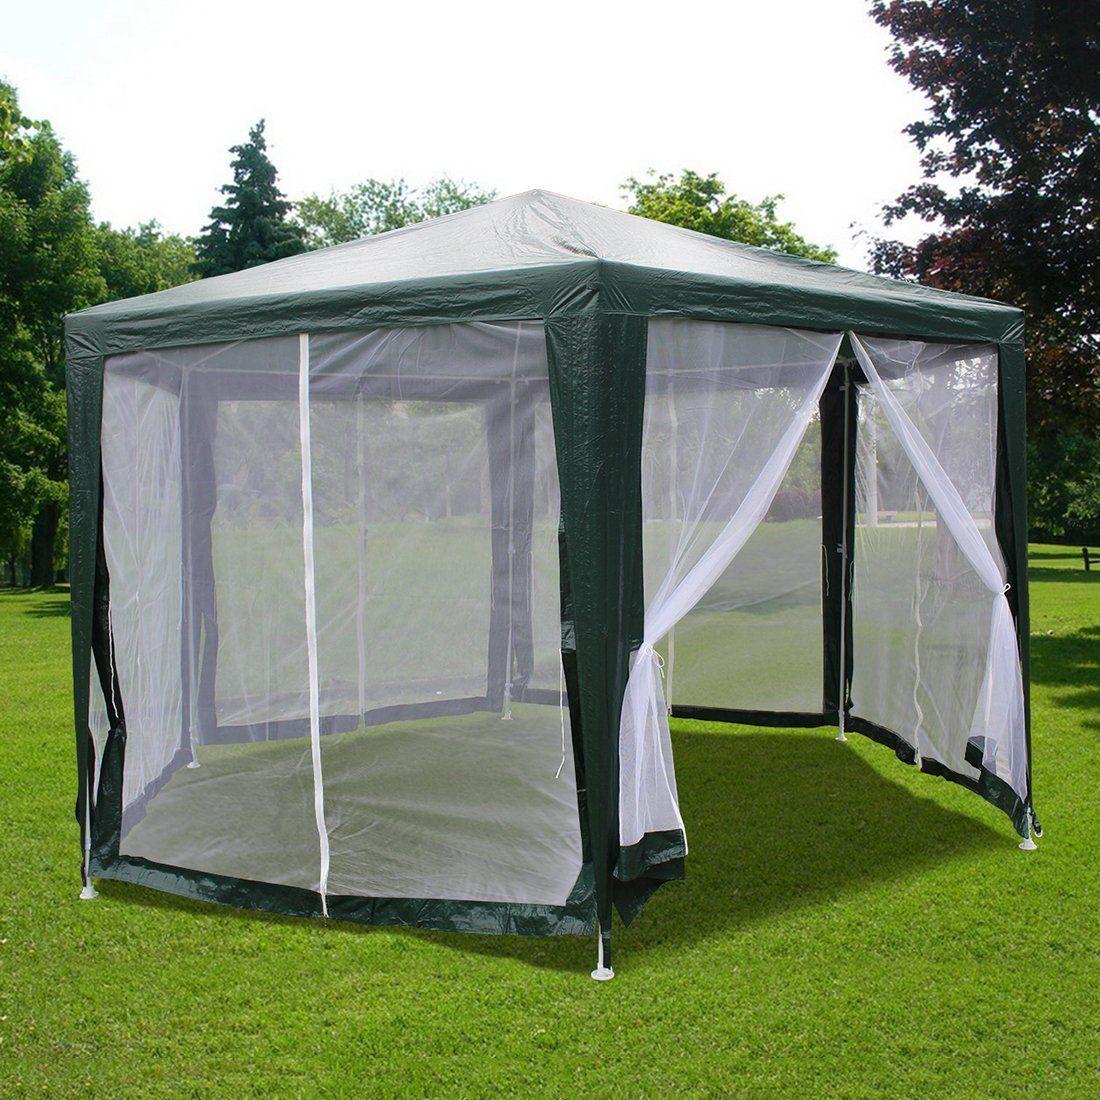 Amazon Com Quictent 6 6 X6 6 X6 6 Outdoor Hexagon Canopy Party Tent Gazebo Sun Shade Shelter Screen House With Fully Enclosed Screen House Gazebo Party Tent